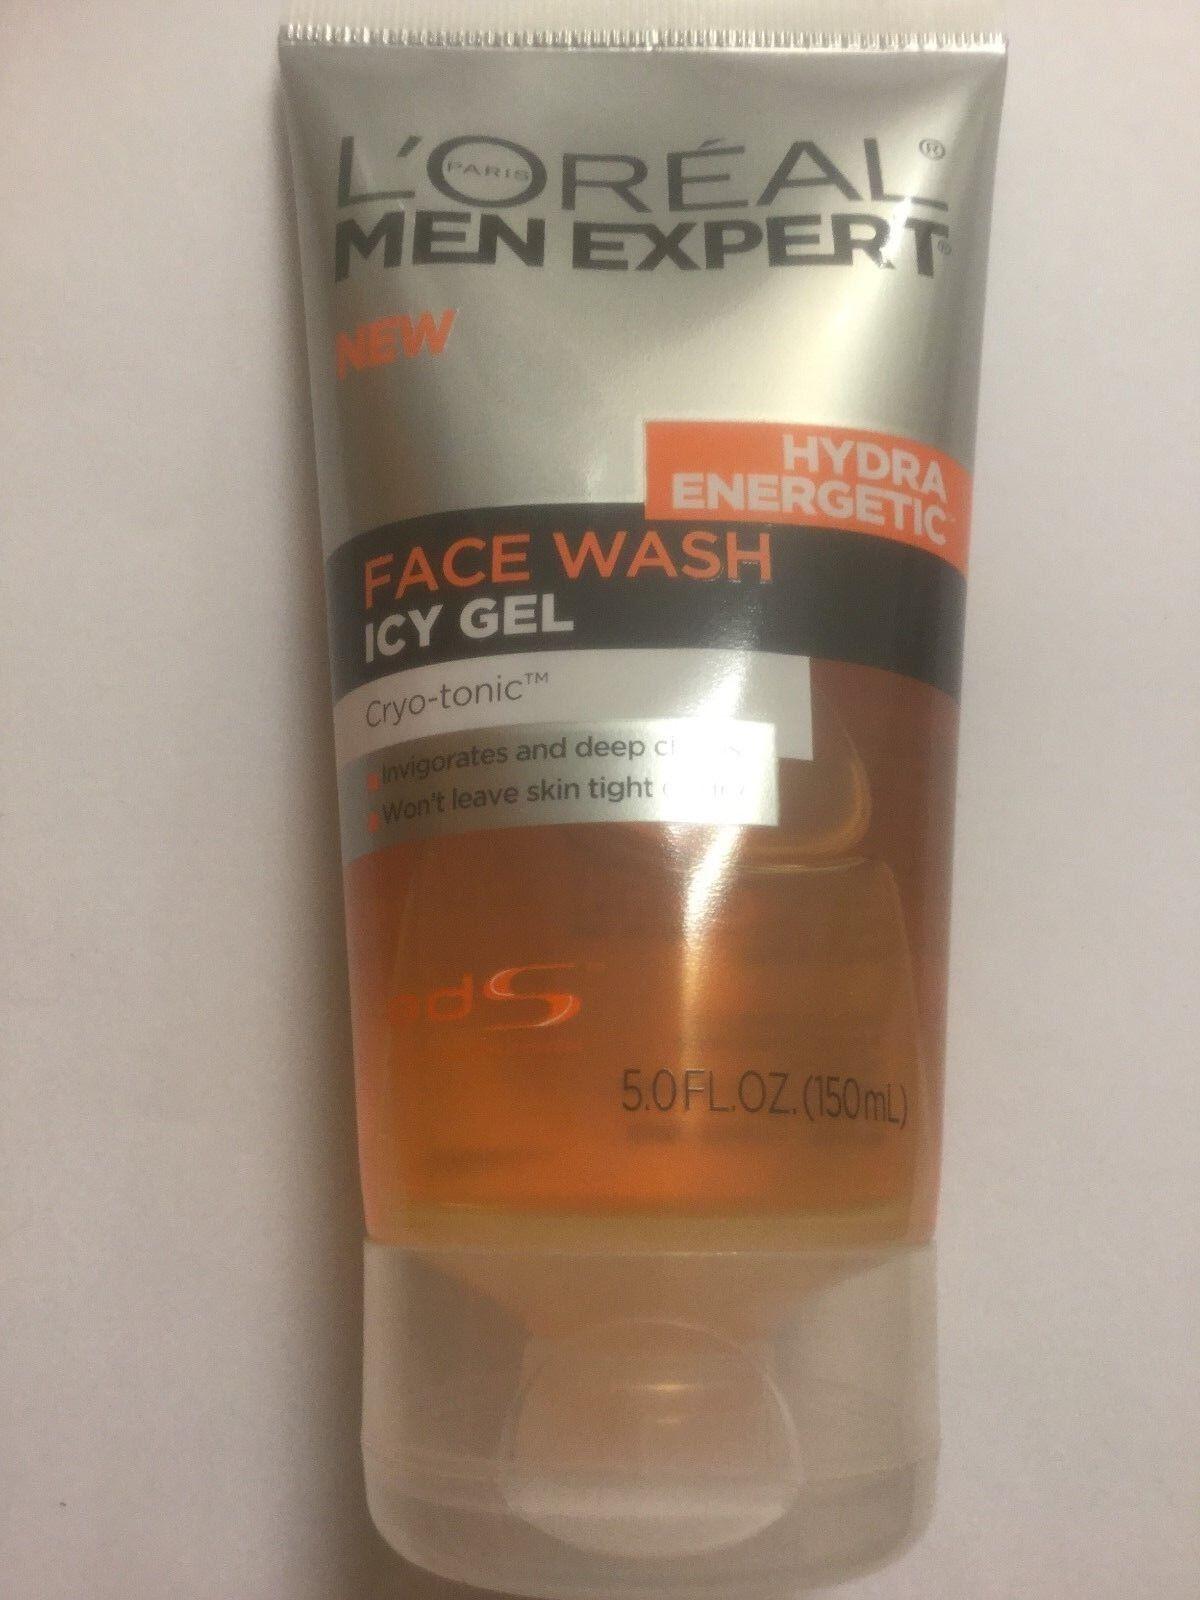 L'Oreal Hydra Energetic Face Wash Icy Gel Cryo-tonic, 5 Fl